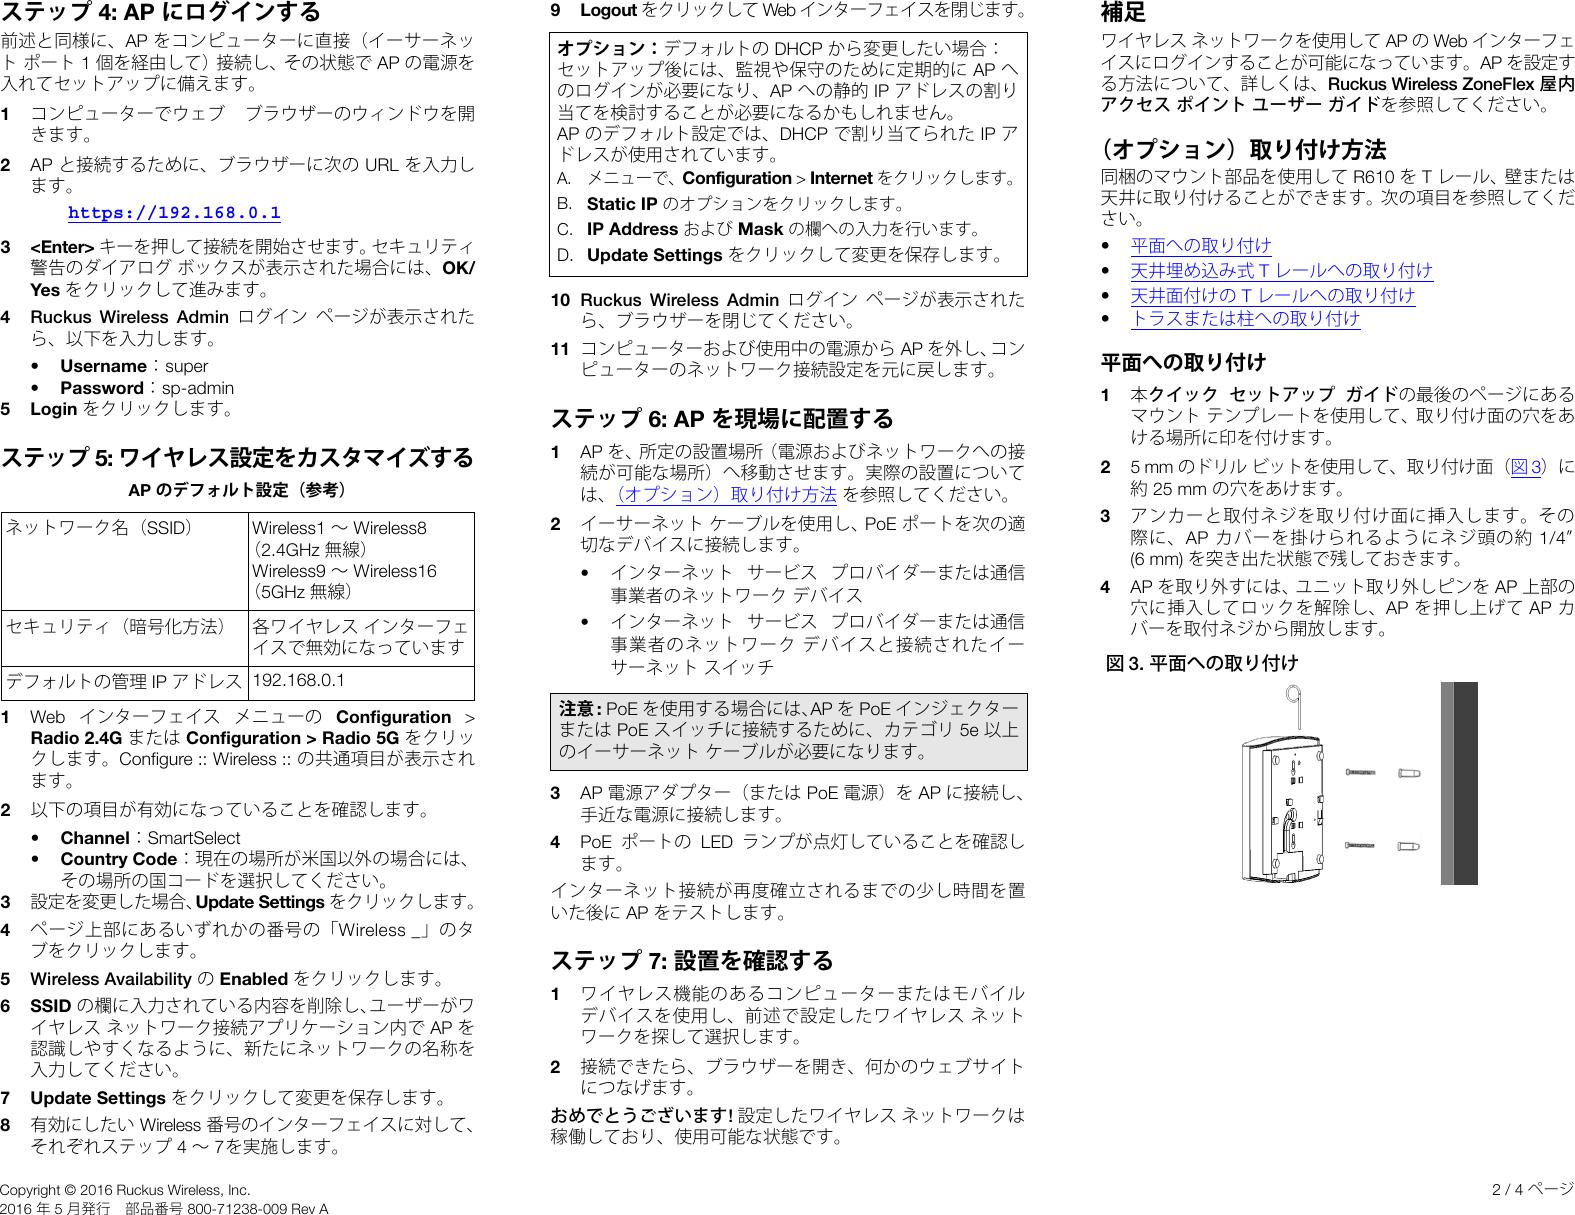 Ruckus R500 Quick Setup Guide R610 (Japanese Version, 日本語